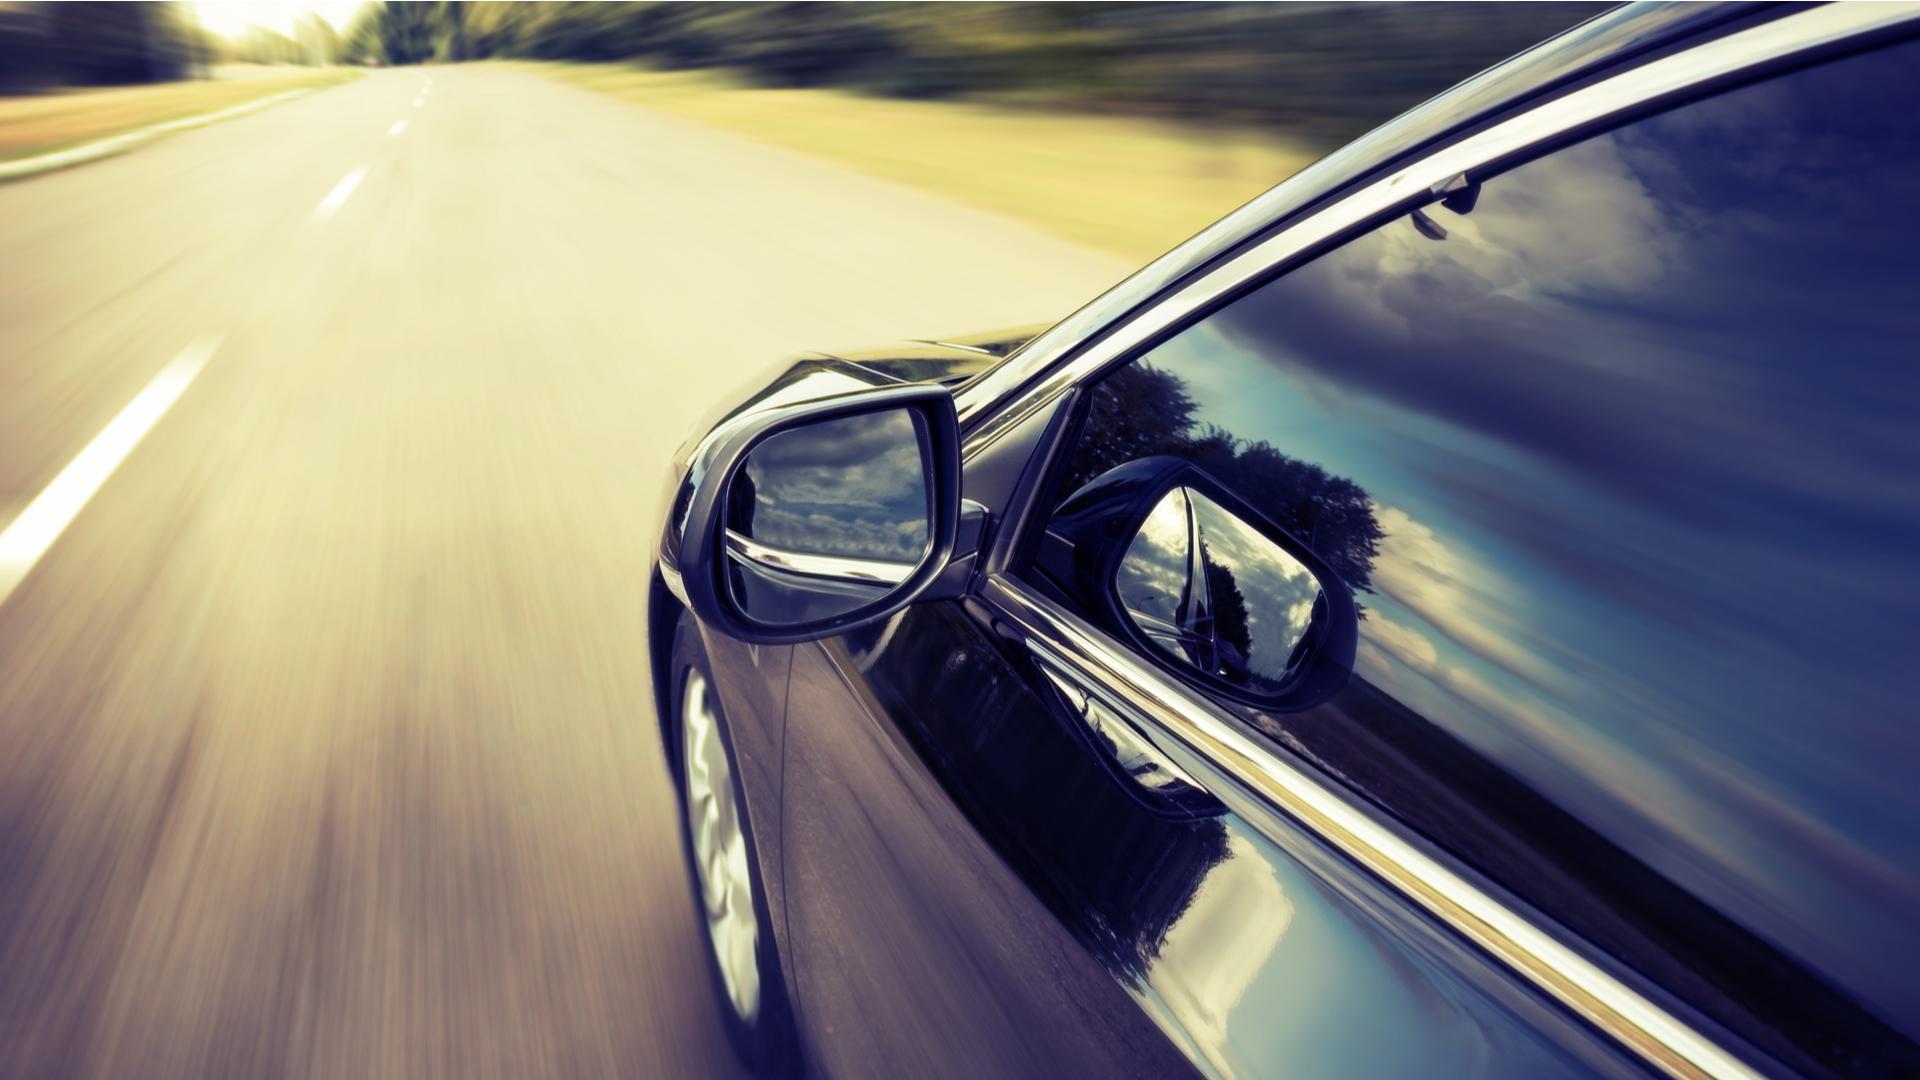 vidros do carro fechados consumo de combustivel ar condicionado shutterstock 163423553